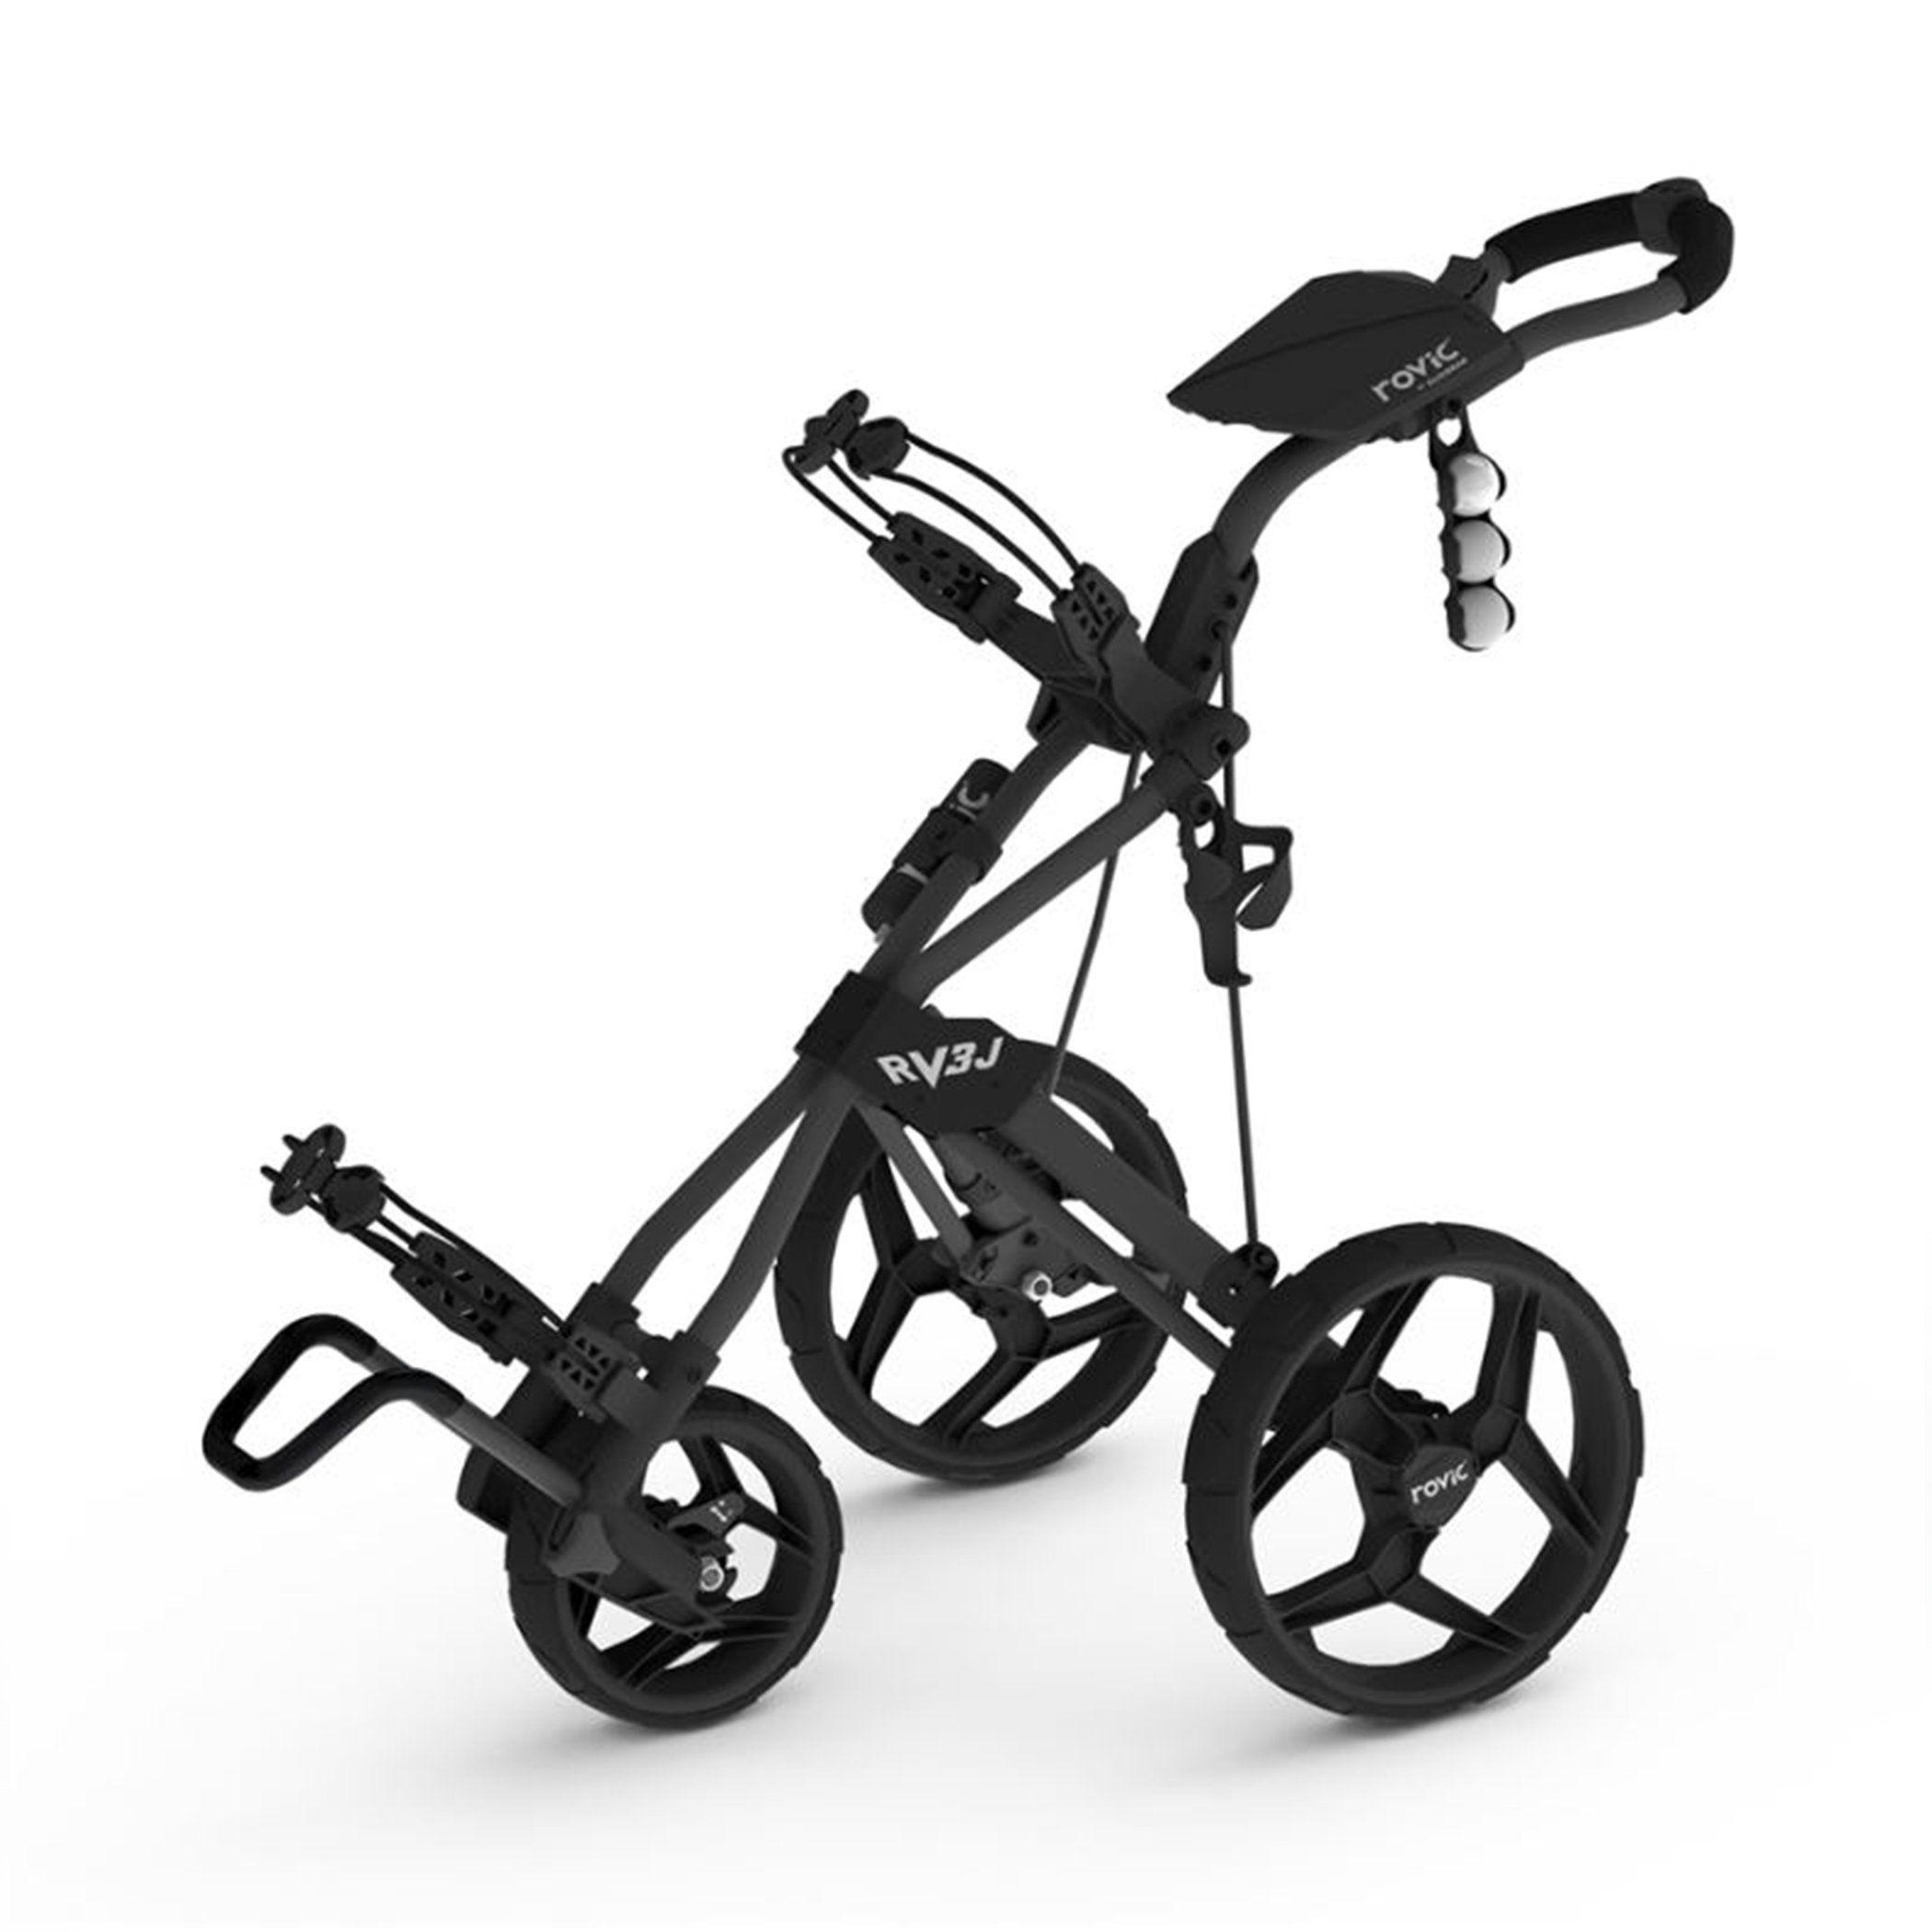 Clicgear Rovic Rv3J - Junior Golf Push Cart   Sports   Pinterest   on electric three wheel, junior golf pull carts 3 wheel, push cart replacement wheel,